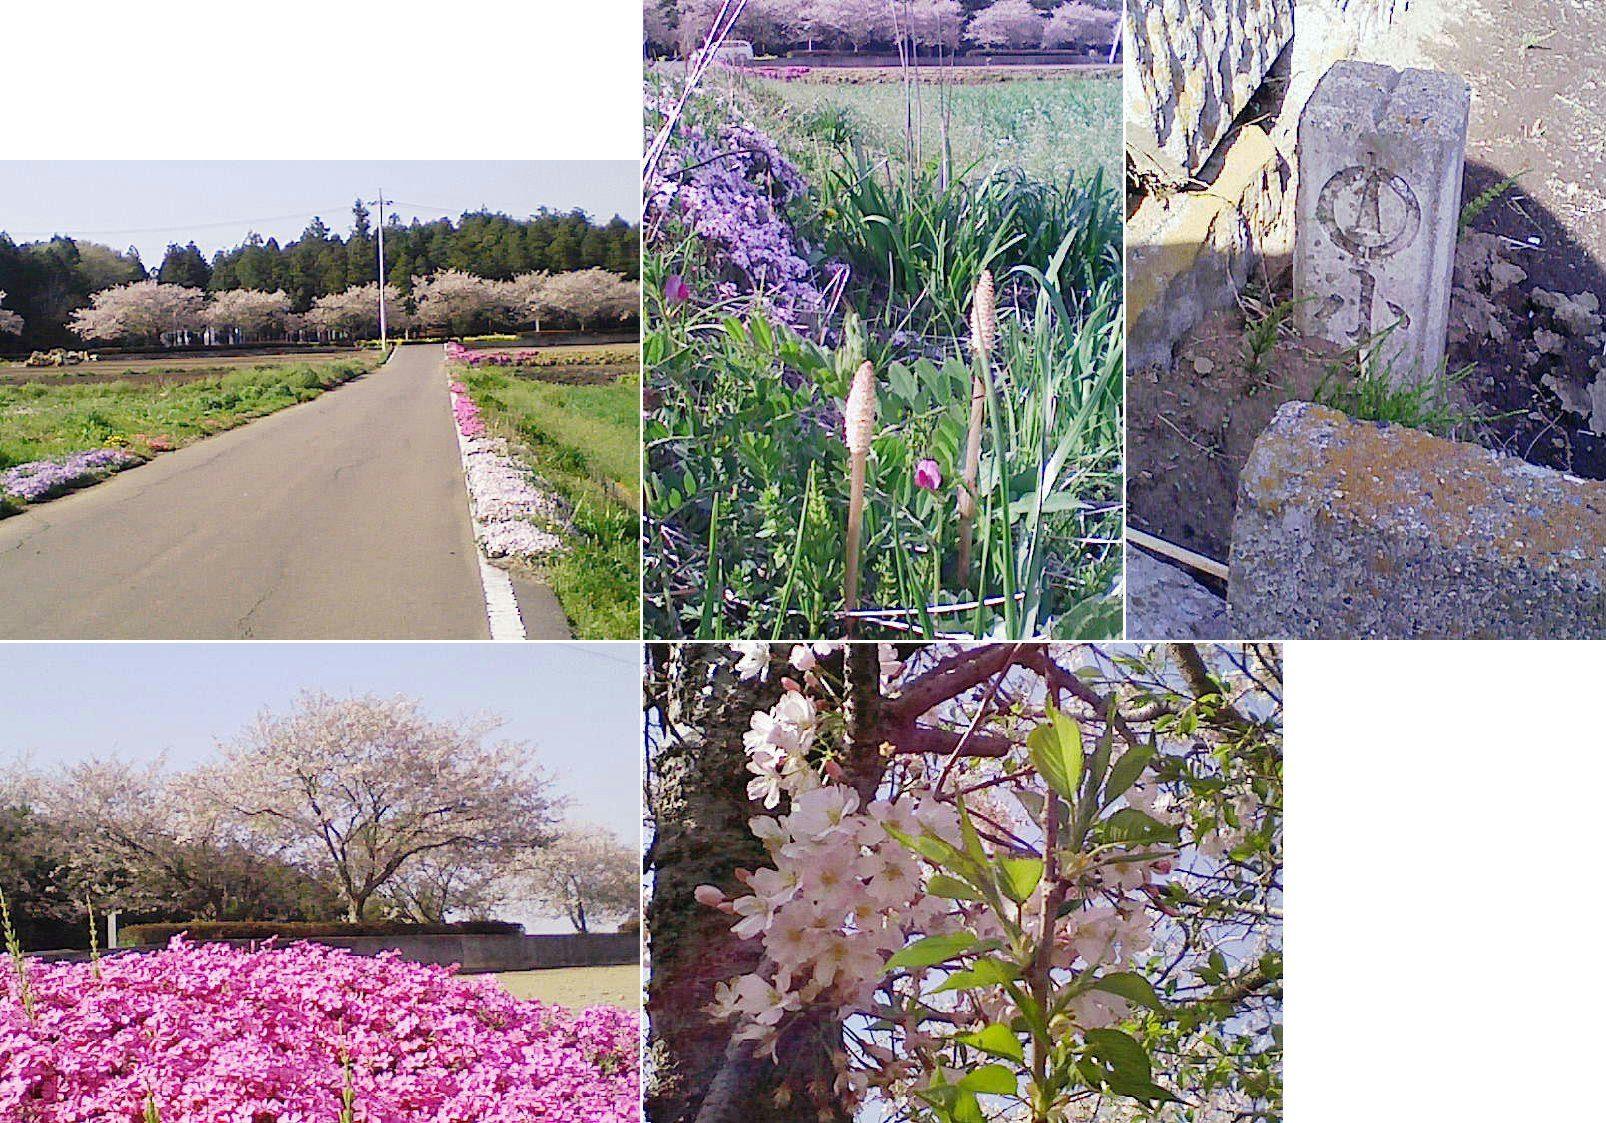 biwatuka2013_18.jpg